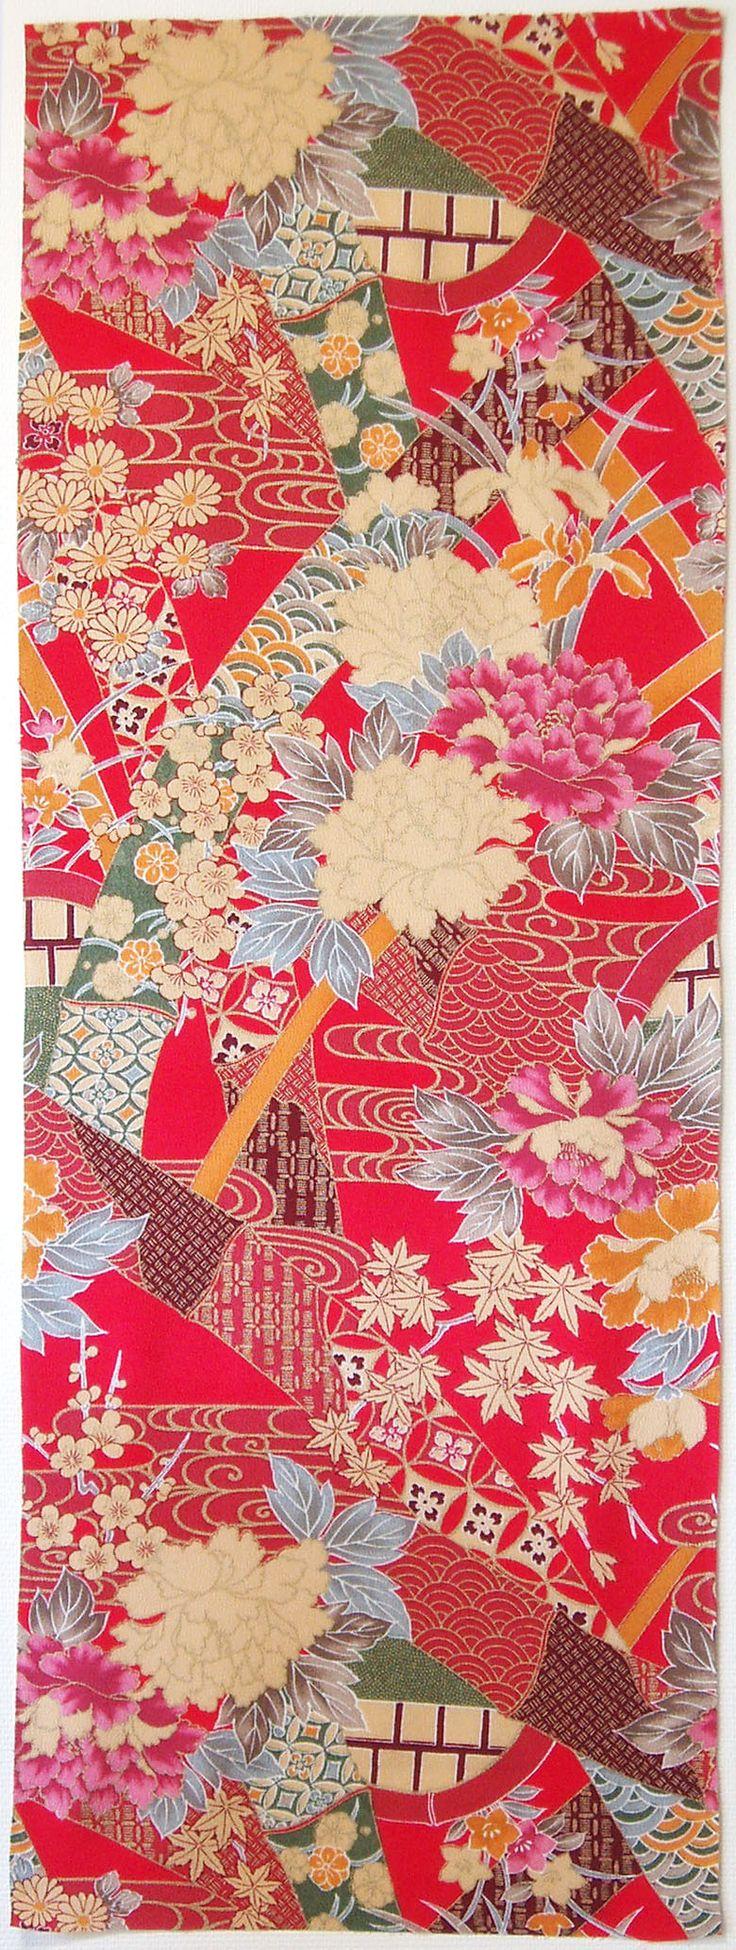 Kimono Pattern | Tattoo Ideas & Inspiration - Japanese Art